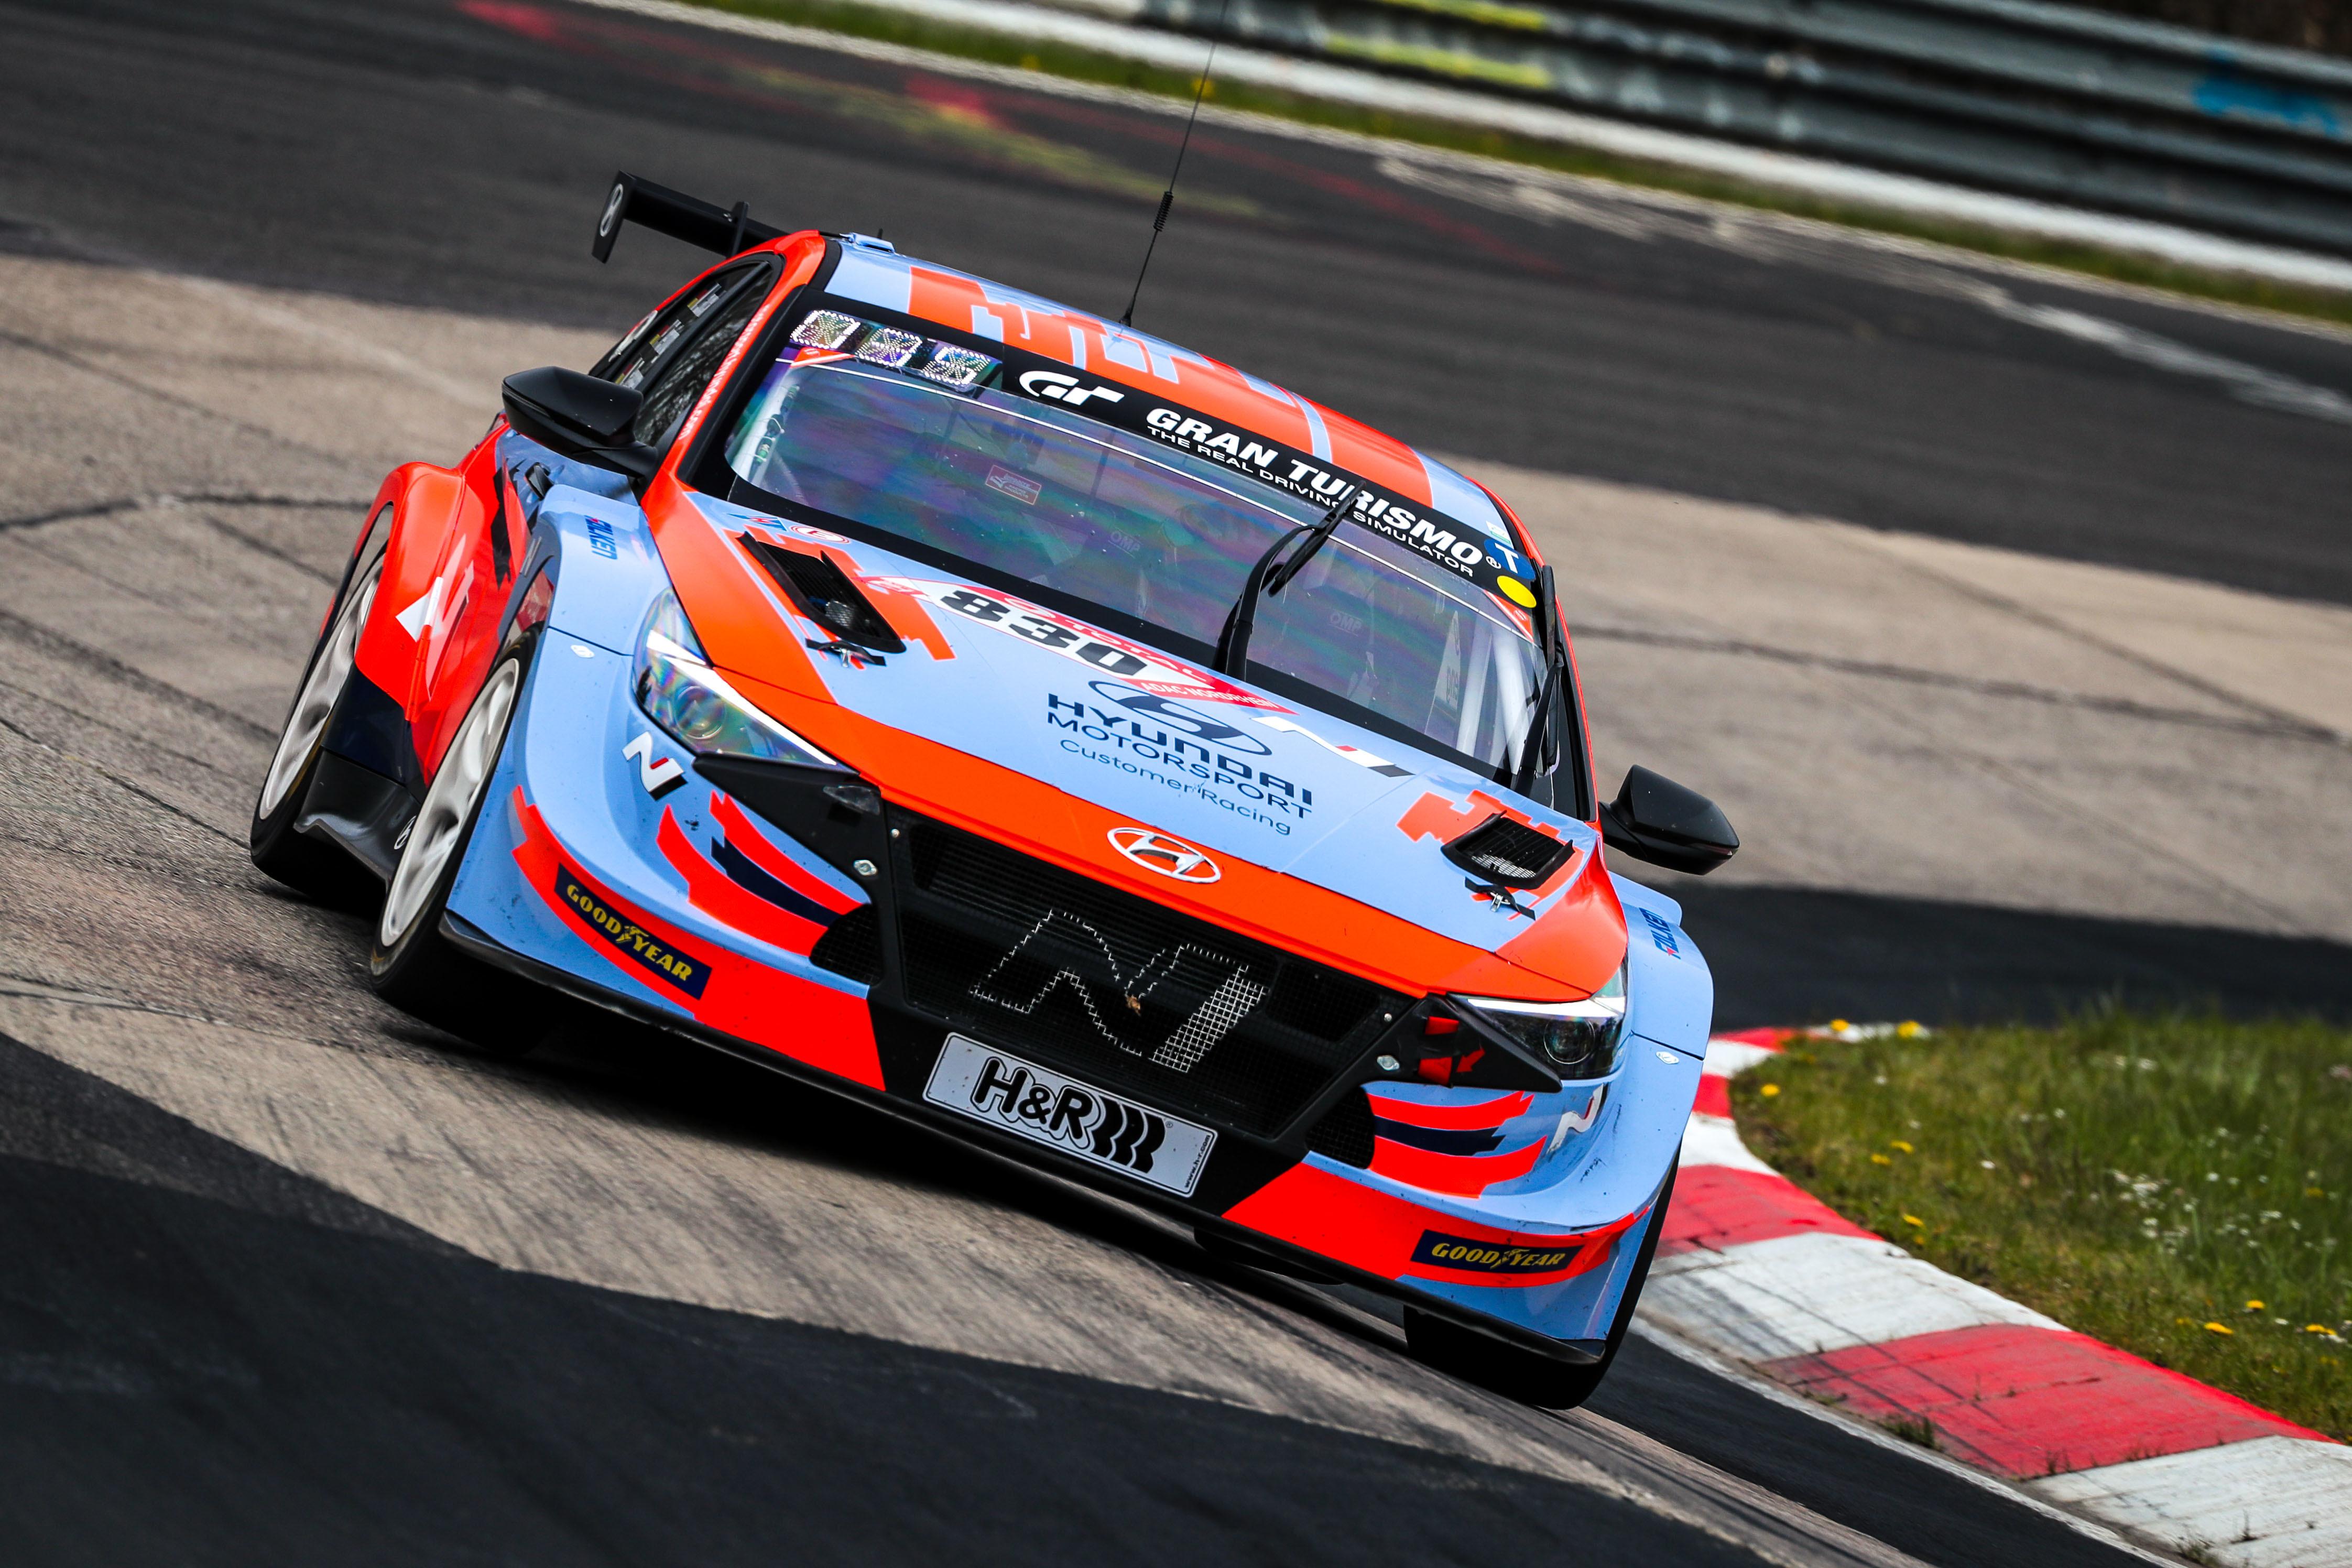 Elantra N TCR - Nürburgring 24 Hours Qualifying Race